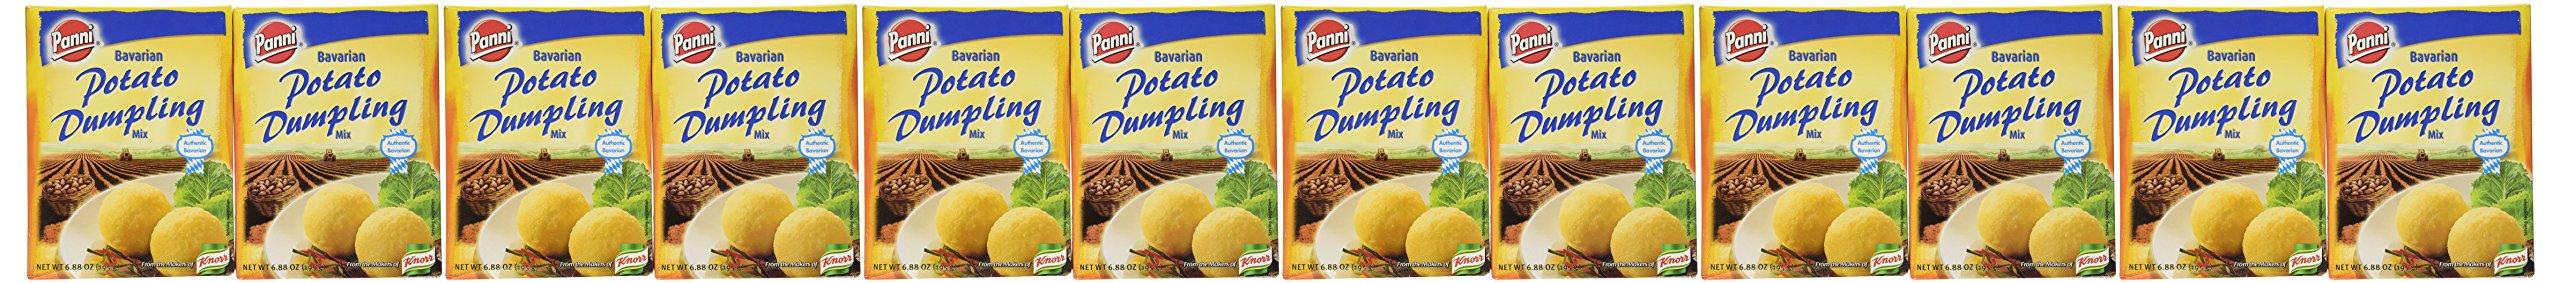 Panni Bavarian Potato Dumpling, 6.88 Ounce (Pack of 12)